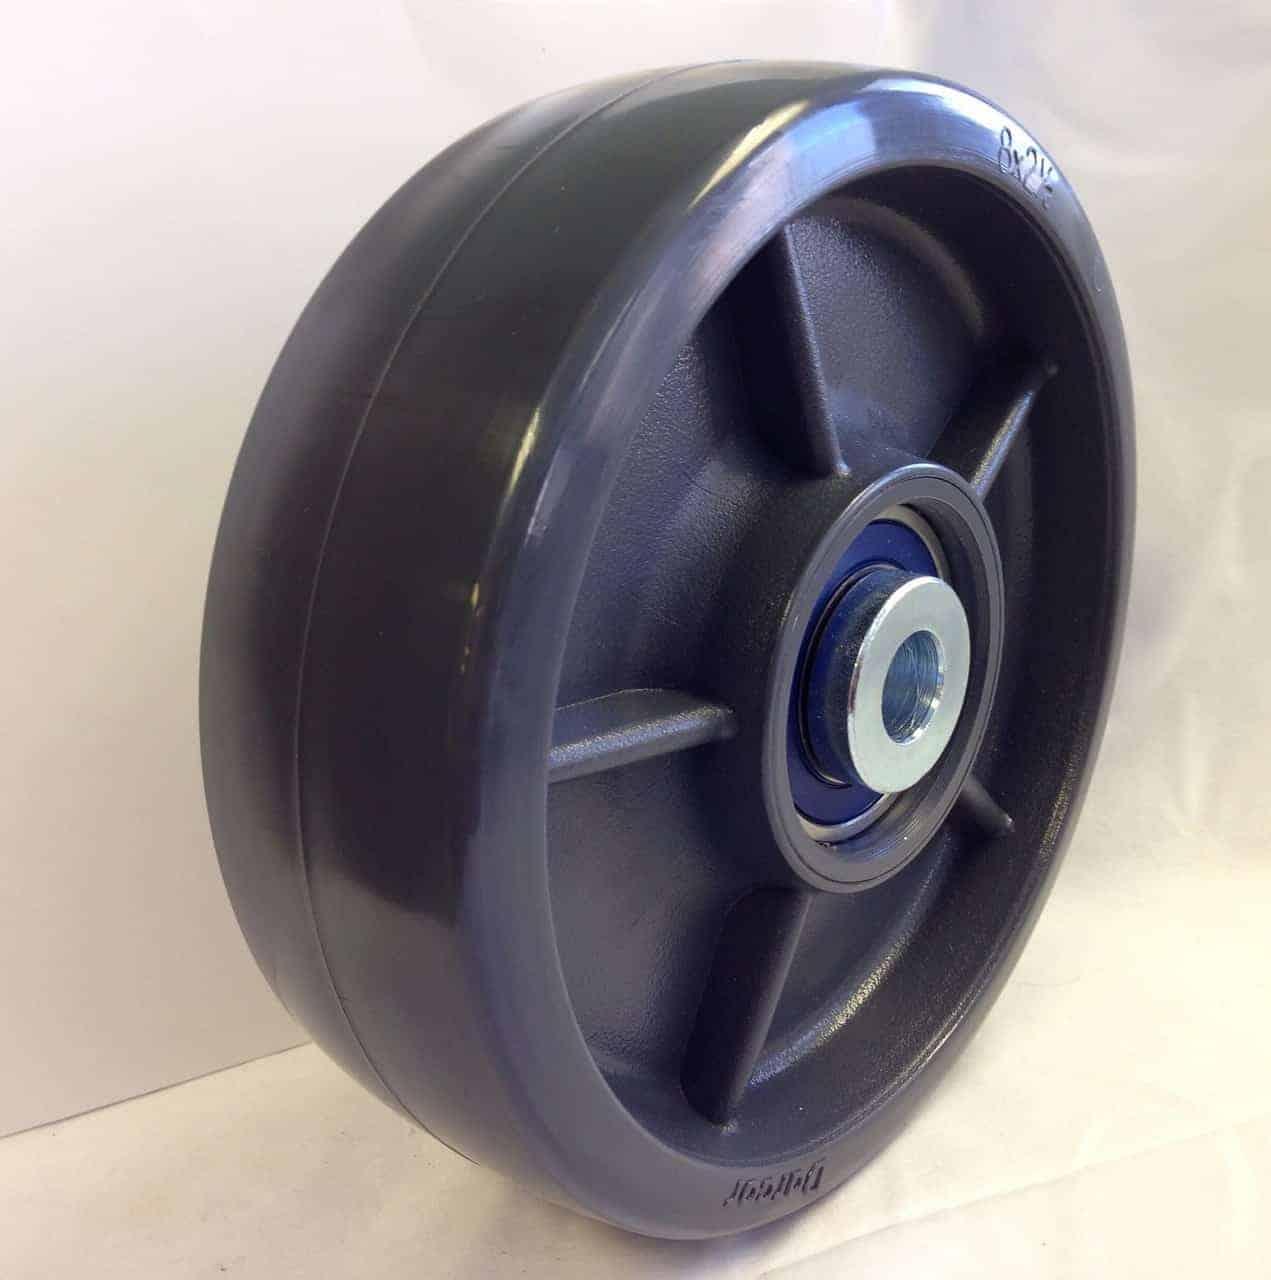 6″ Solid Elastomer Wheel With 3/4″ Precision Sealed Ball Bearing 2-3/4 Hub 1500 Lbs Capacity